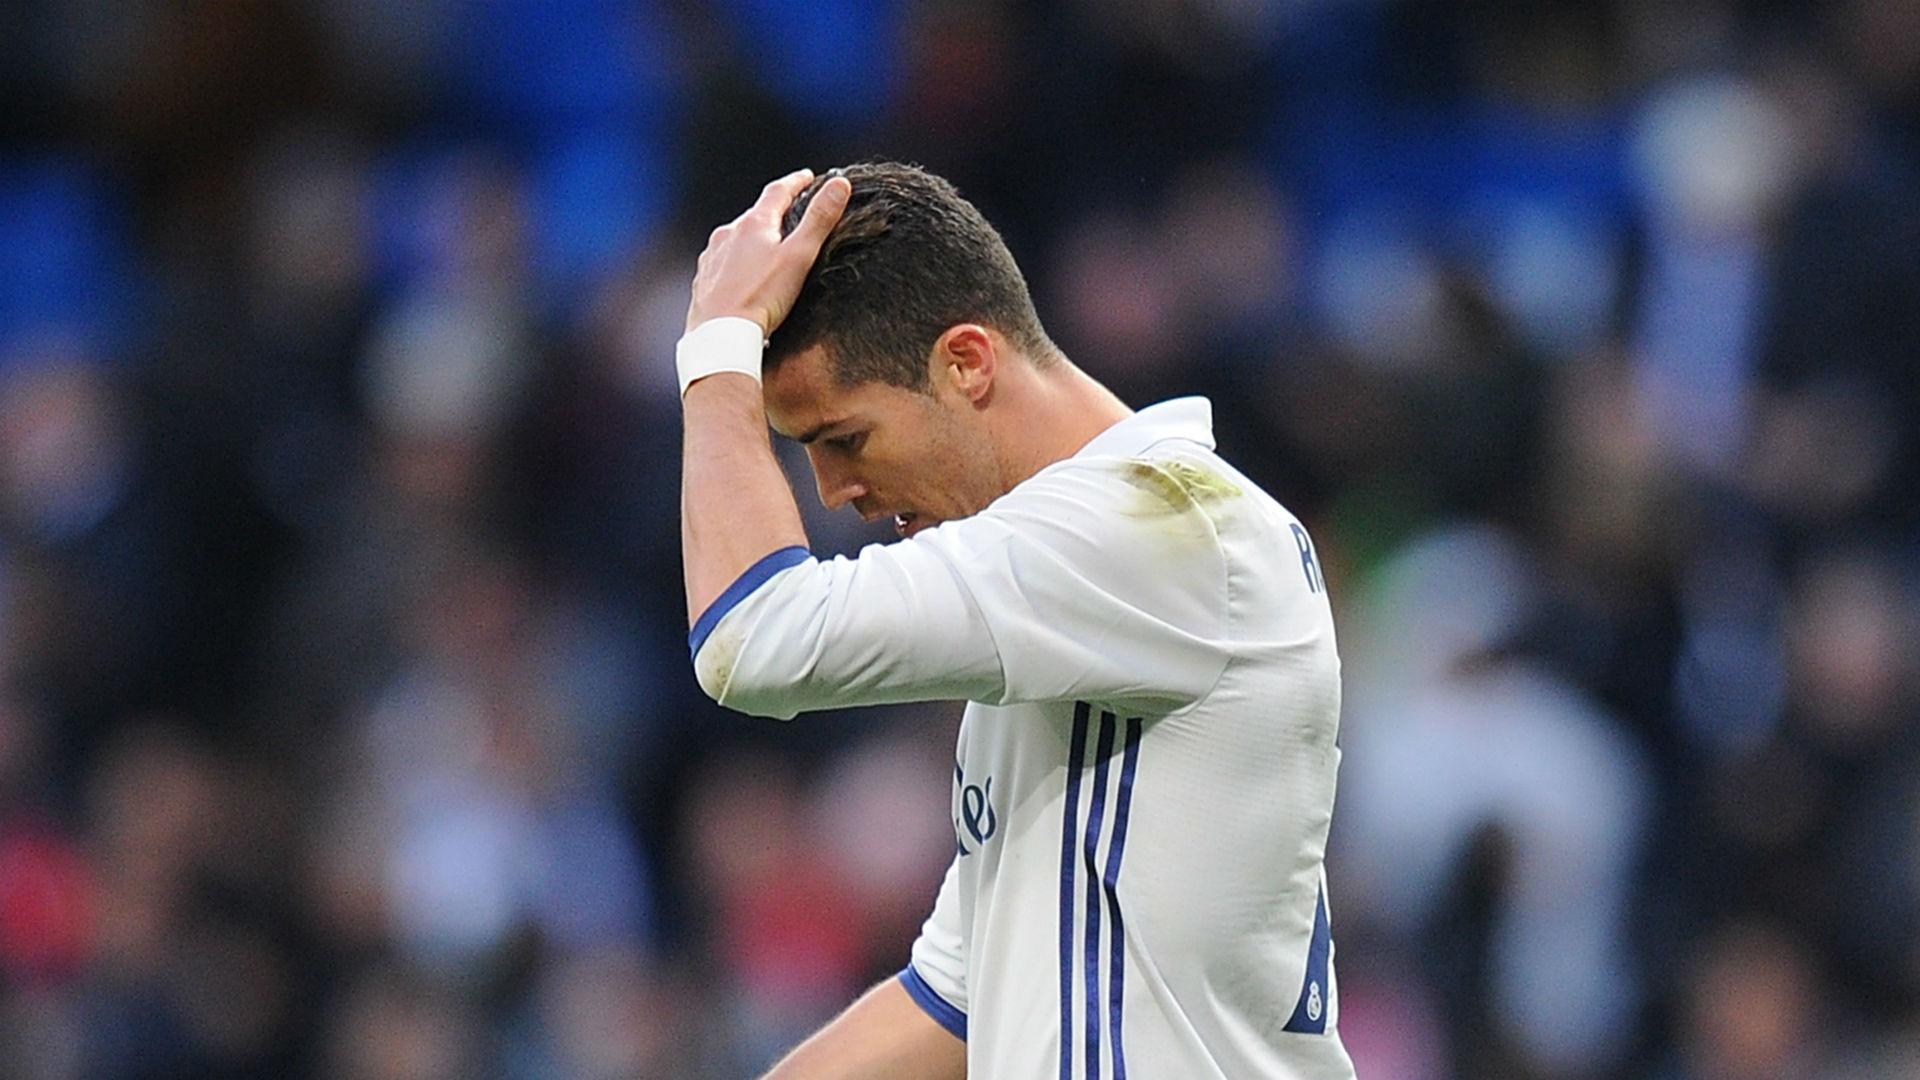 Real Madrid coach Zinedine Zidane: I'm not thinking about Copa failure